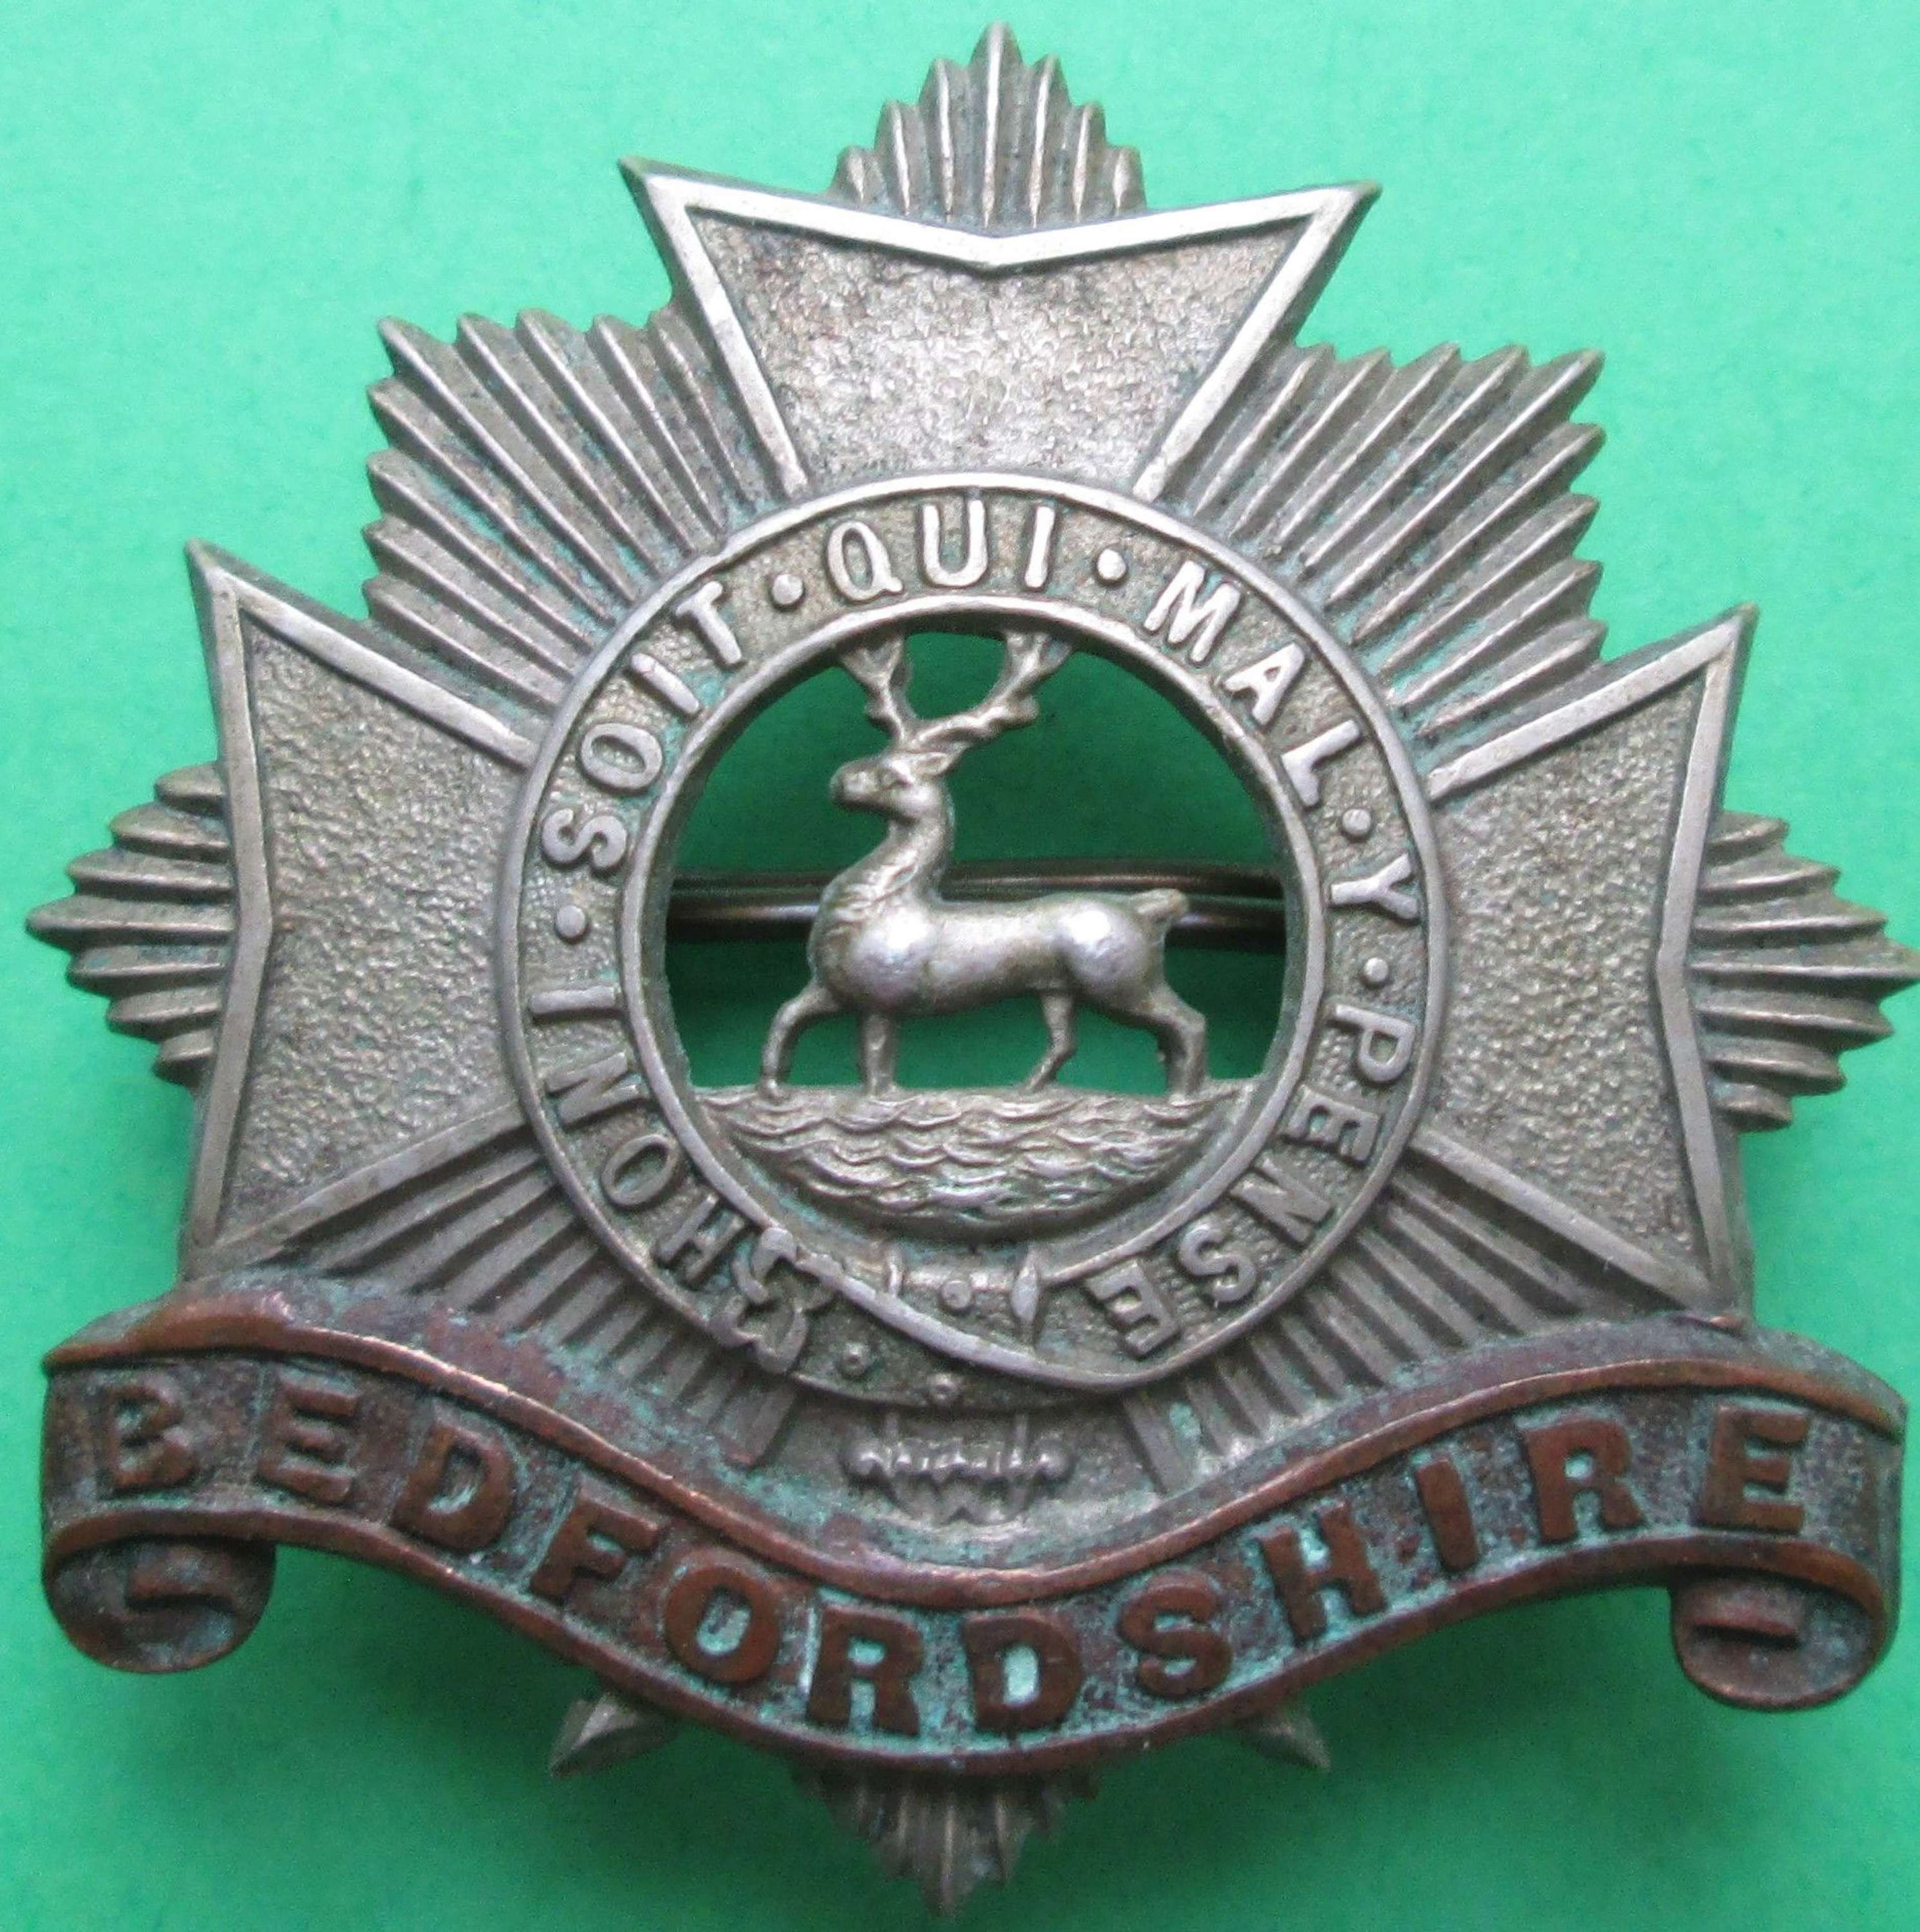 A BEDFORDSHIRE REGIMENT CAP BADGE